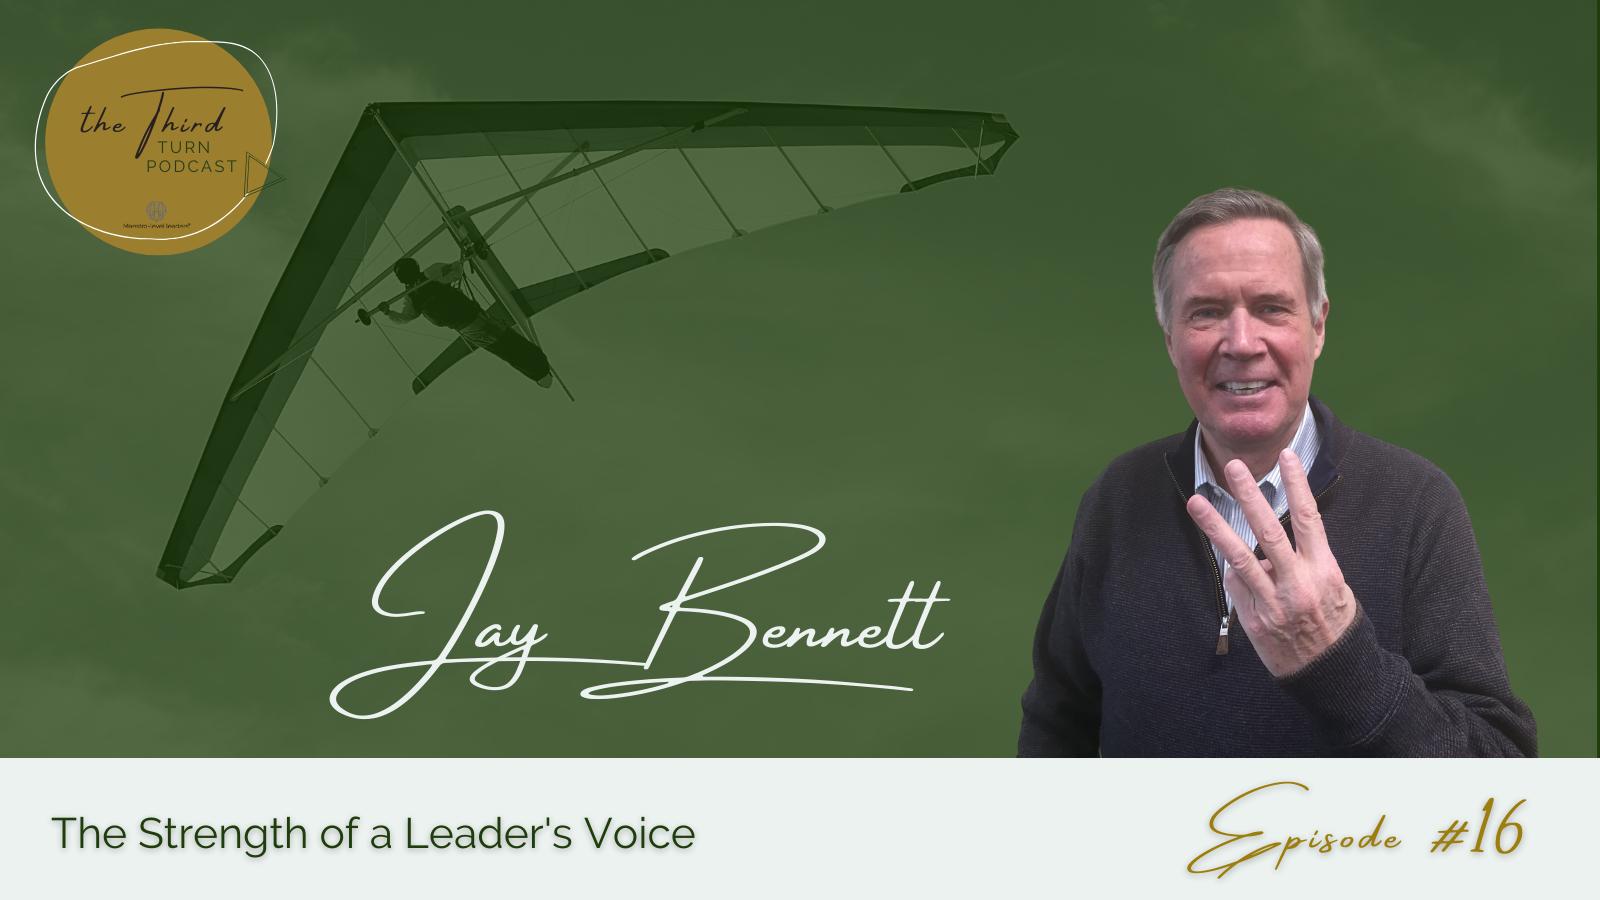 031621 - Jay Bennett Blog Post Header